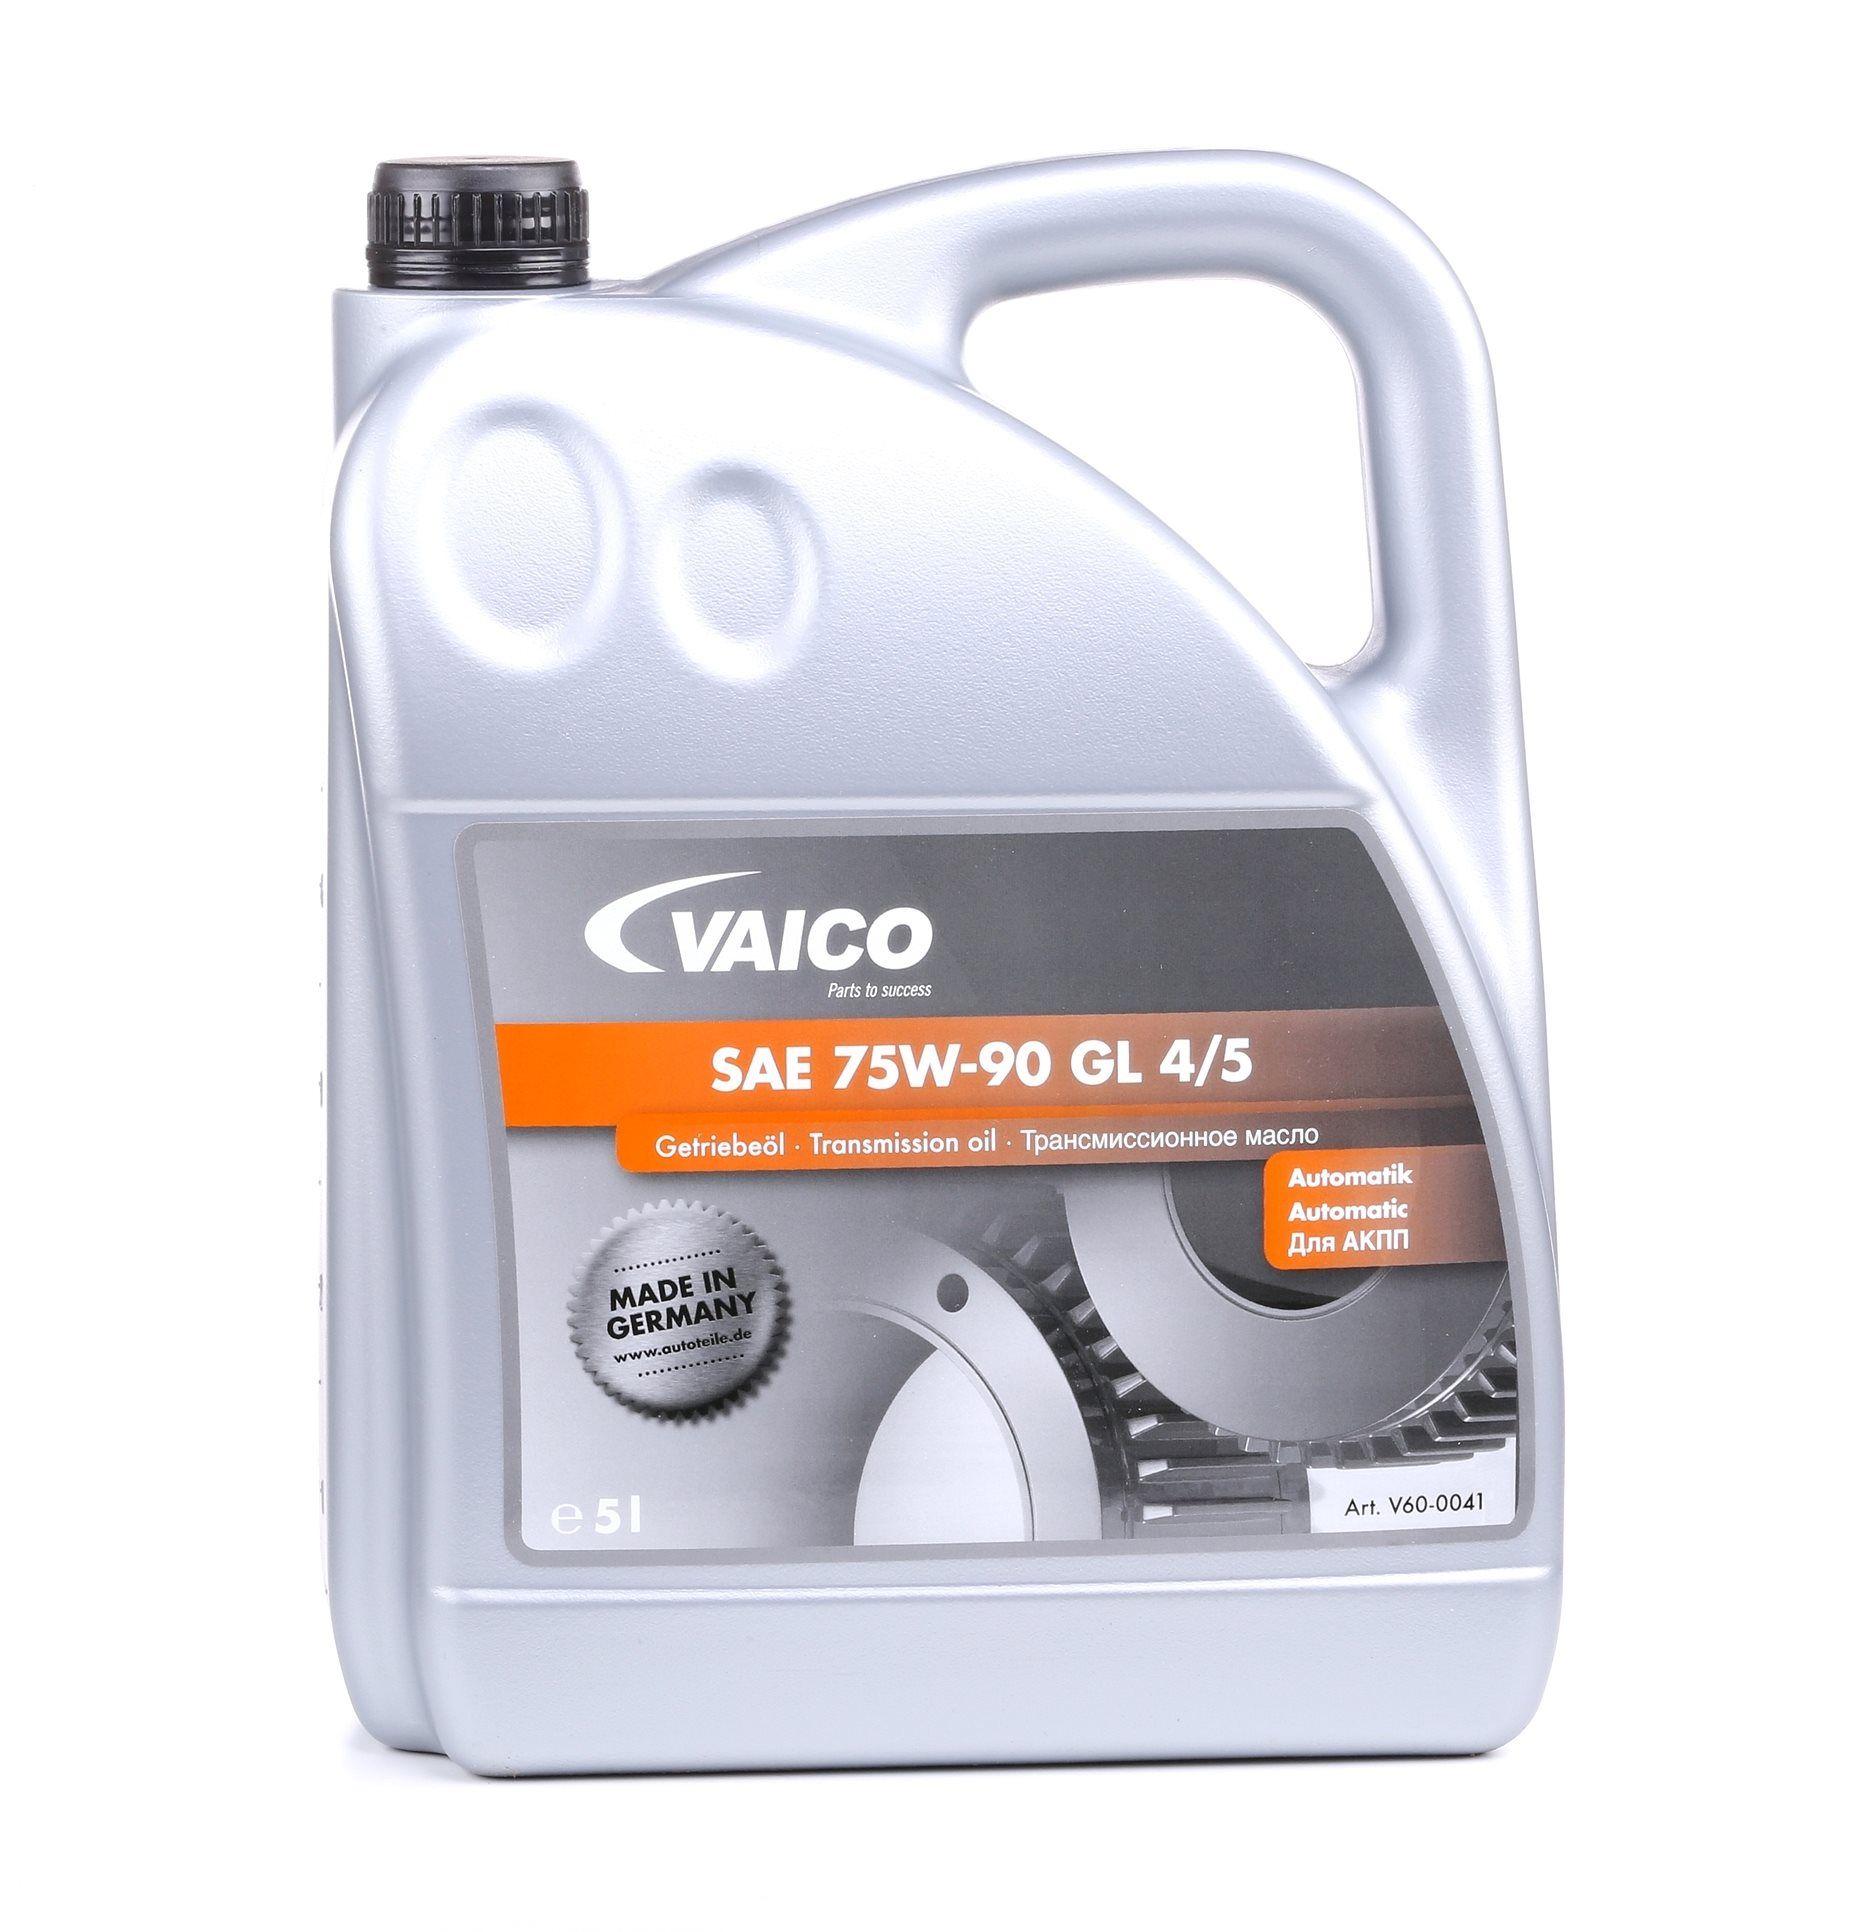 DR DR2 VAICO Olio cambio manuale V60-0041